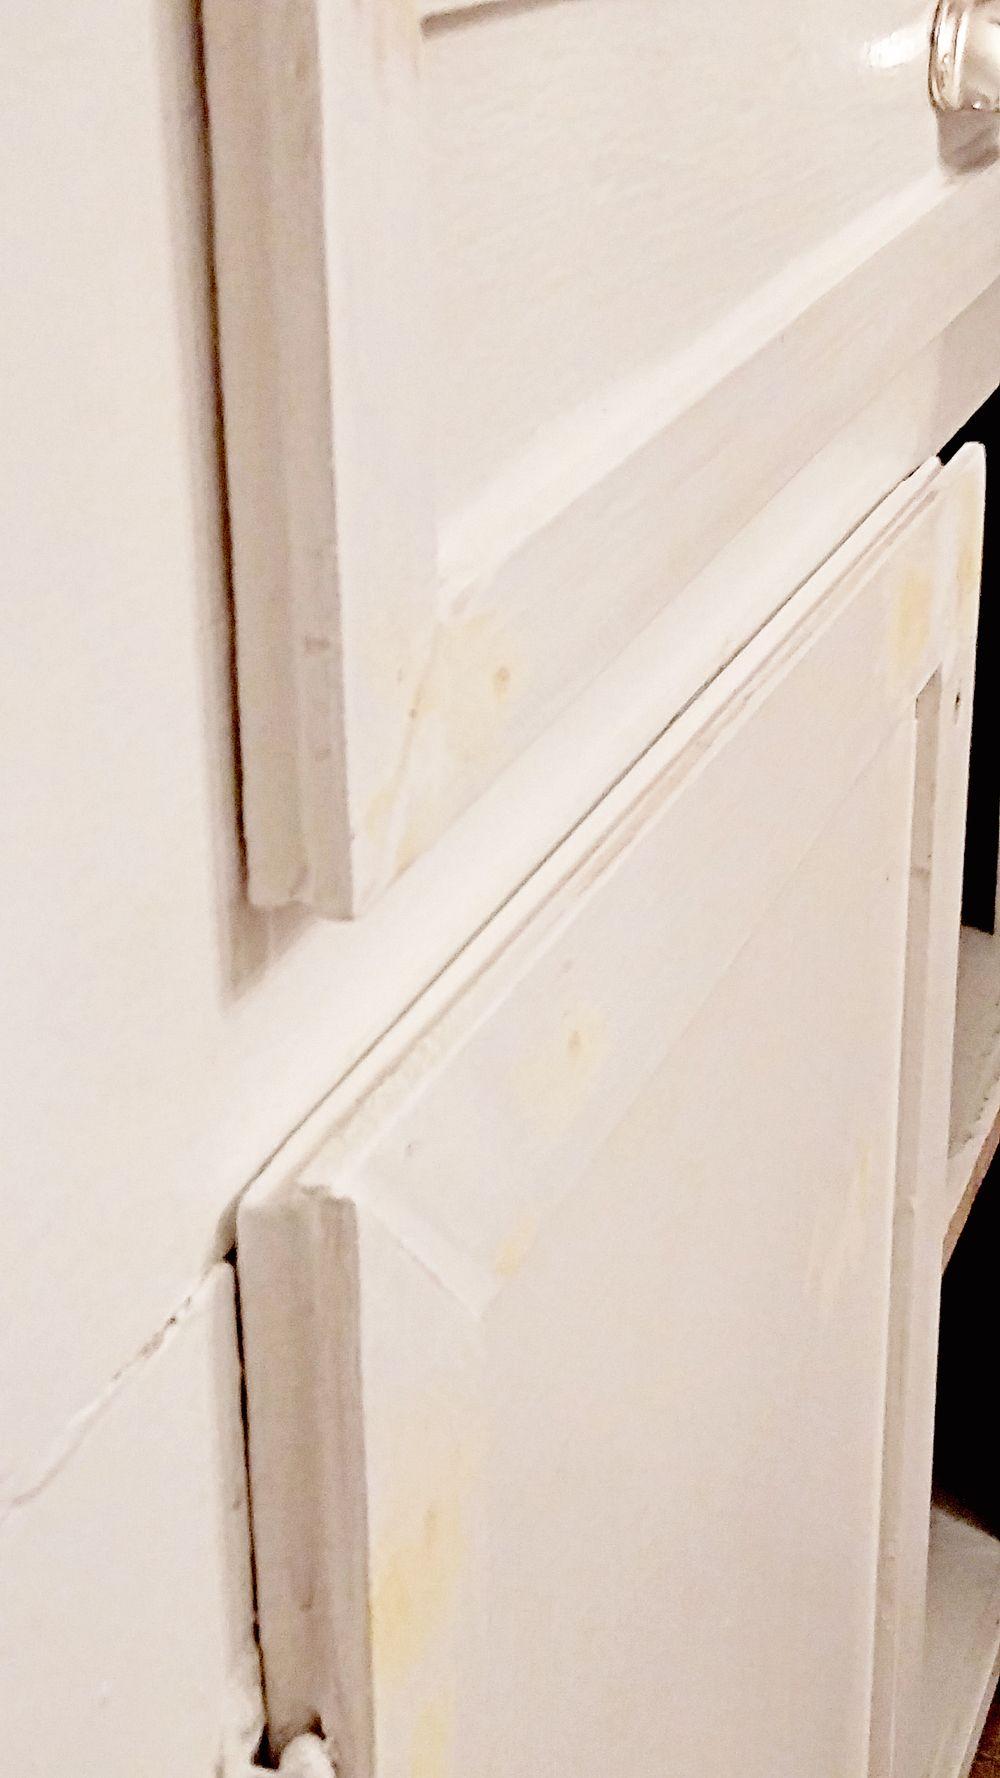 DIY Cabinet Trim Update | Terrie | Pinterest